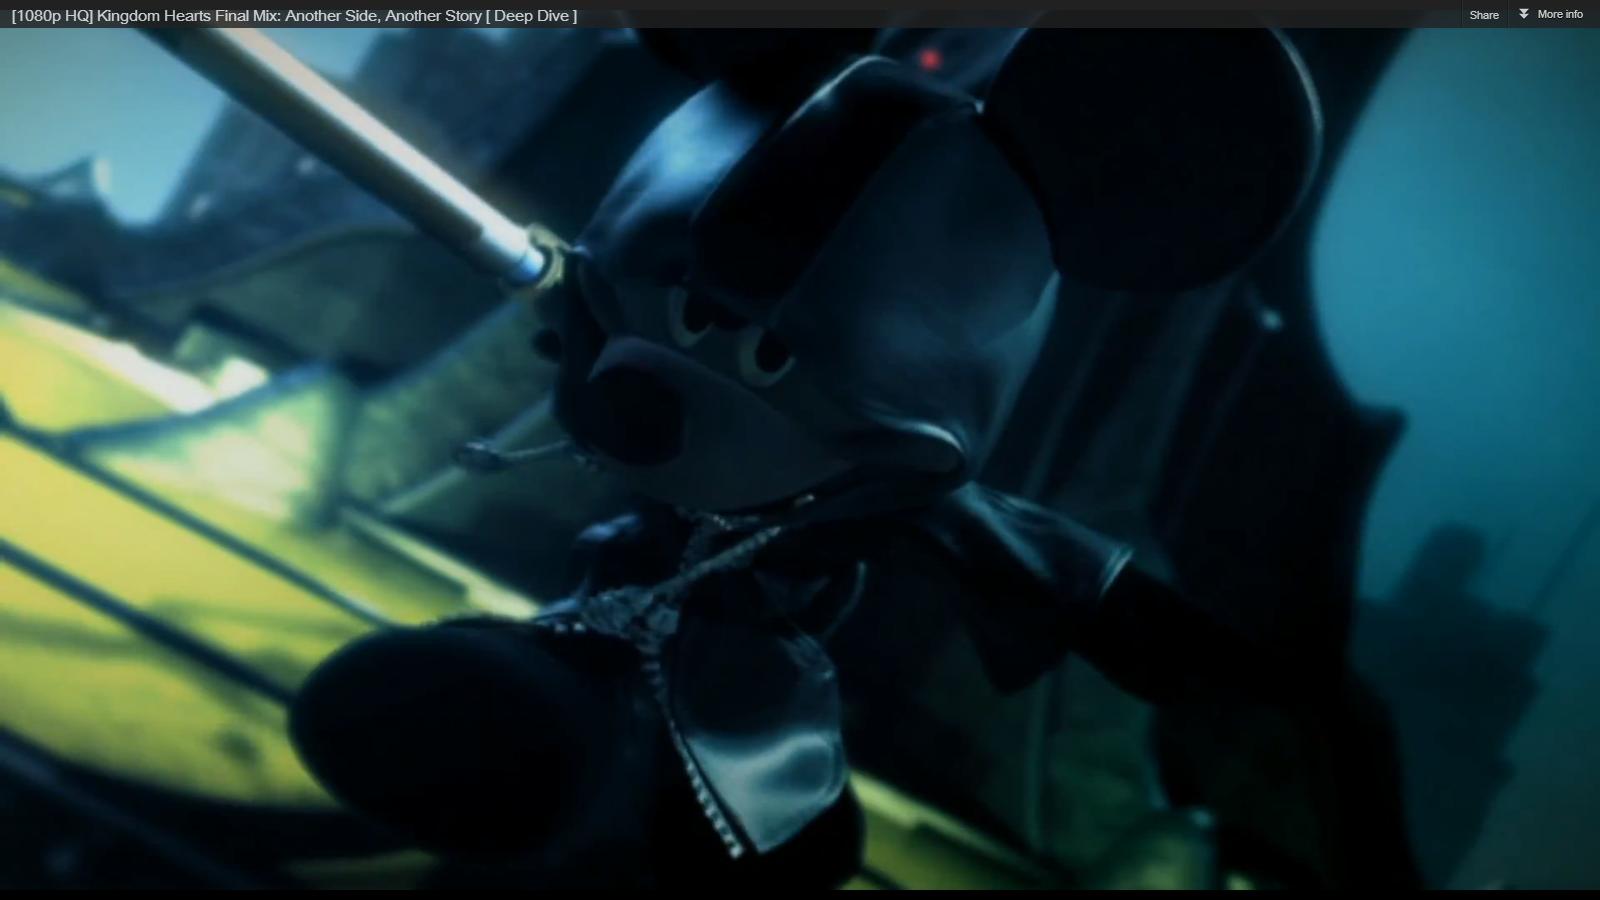 Image Deep Dive Mickey Png Kingdom Hearts Wiki Fandom Powered